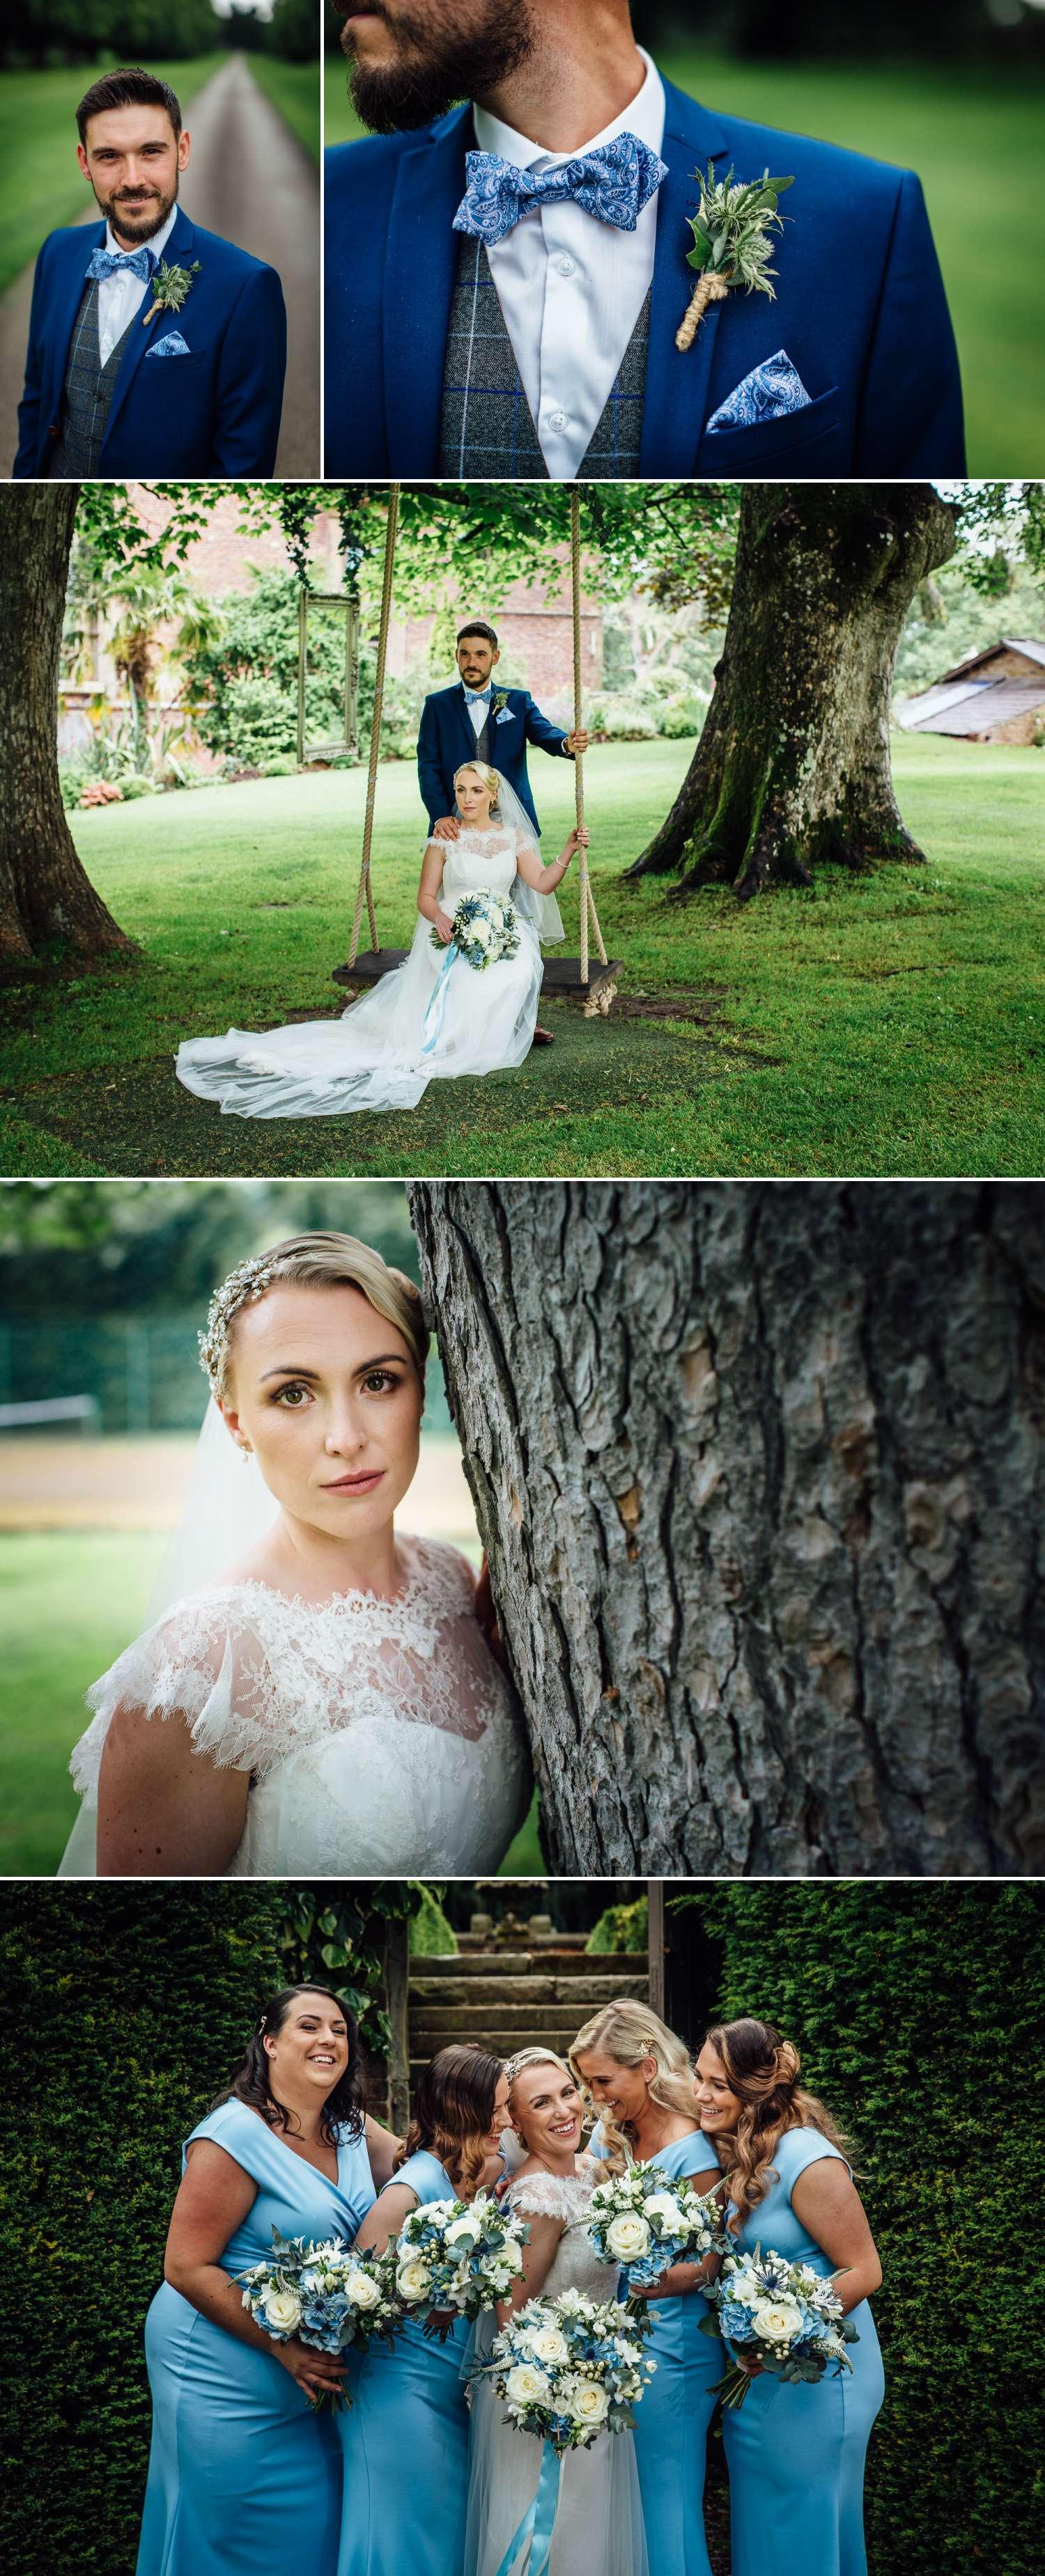 Wedding photography portraits in Soughton Hall wedding ground